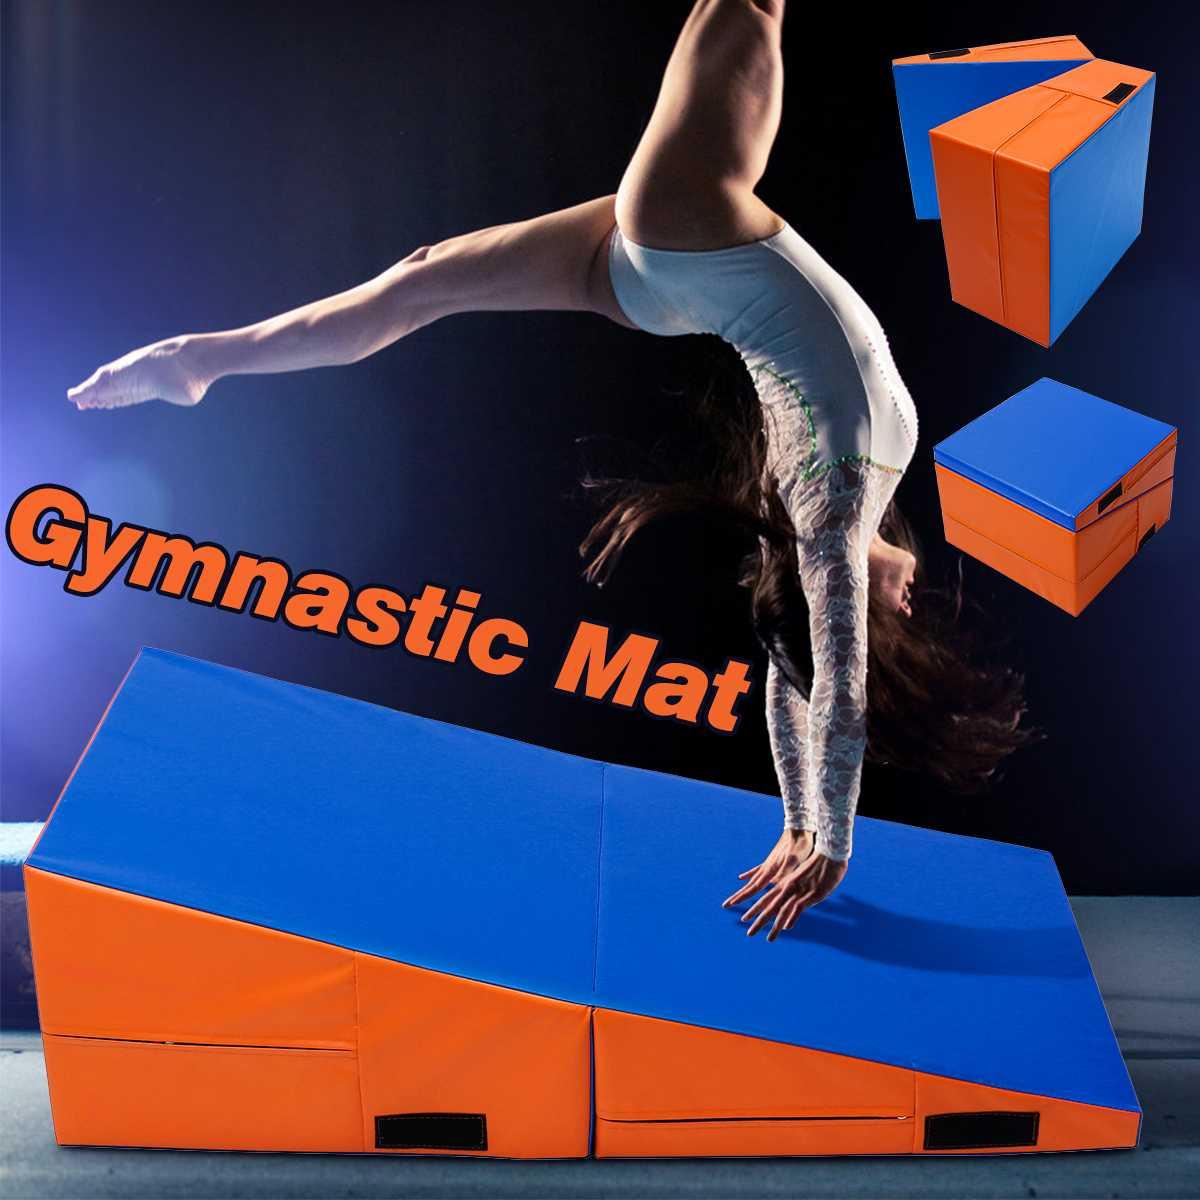 Incline Foldable Gymnastics Mat PU Foam Filling Skill Tumbling Gymnastics Mat Ramp Fitness Equipment 3 Sizes  Safe Exercise